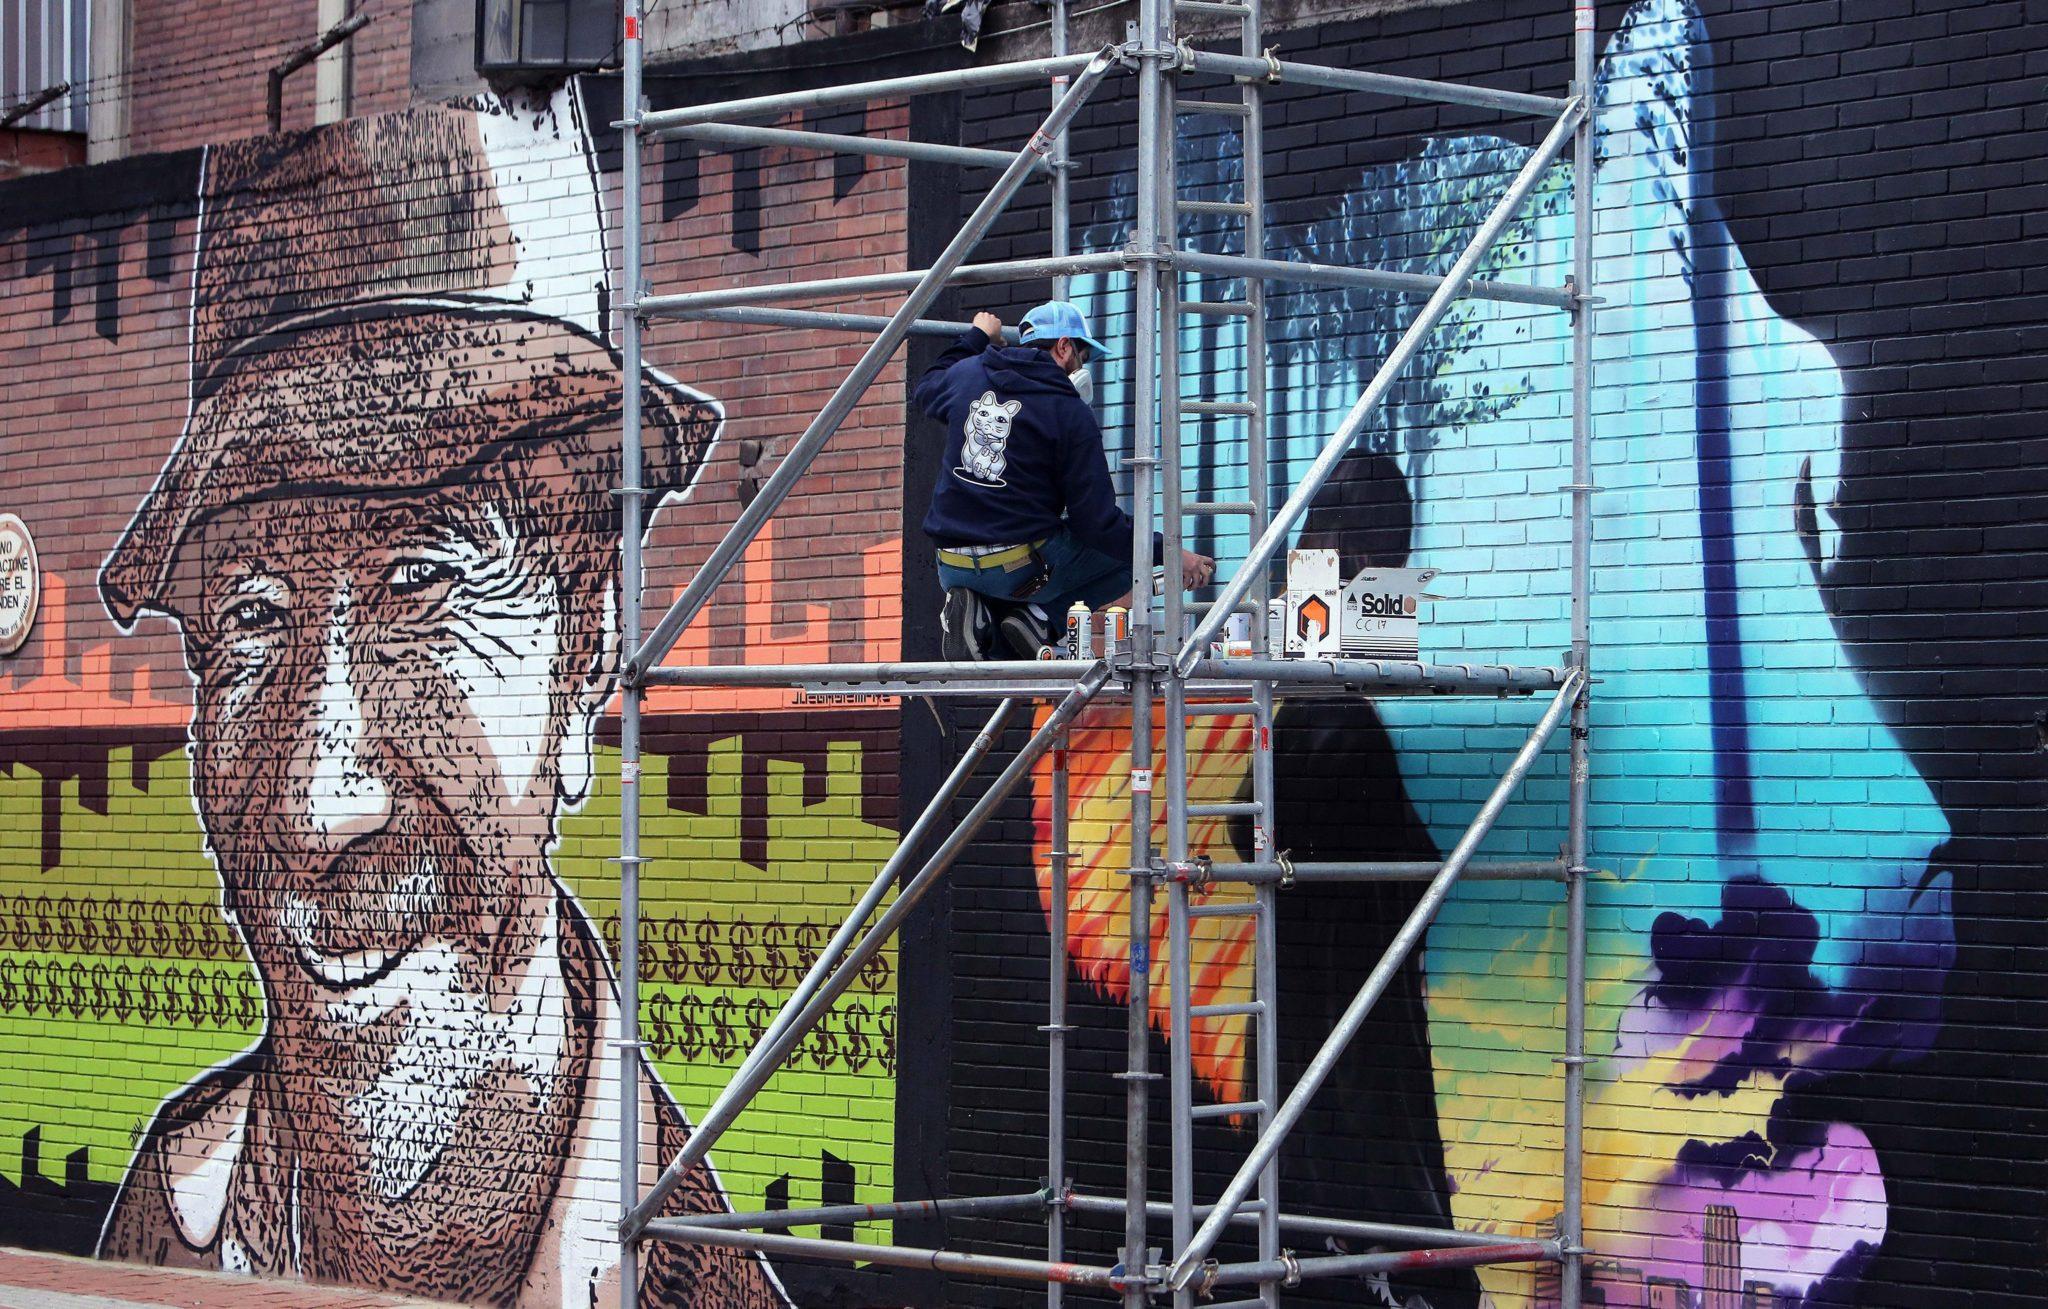 Kolumbia: festiwal sztuki miejskiej: Ciudad Mural Festiwal w Bogocie (foto. PAP/EPA/MAURICIO DUENAS CASTANEDA)